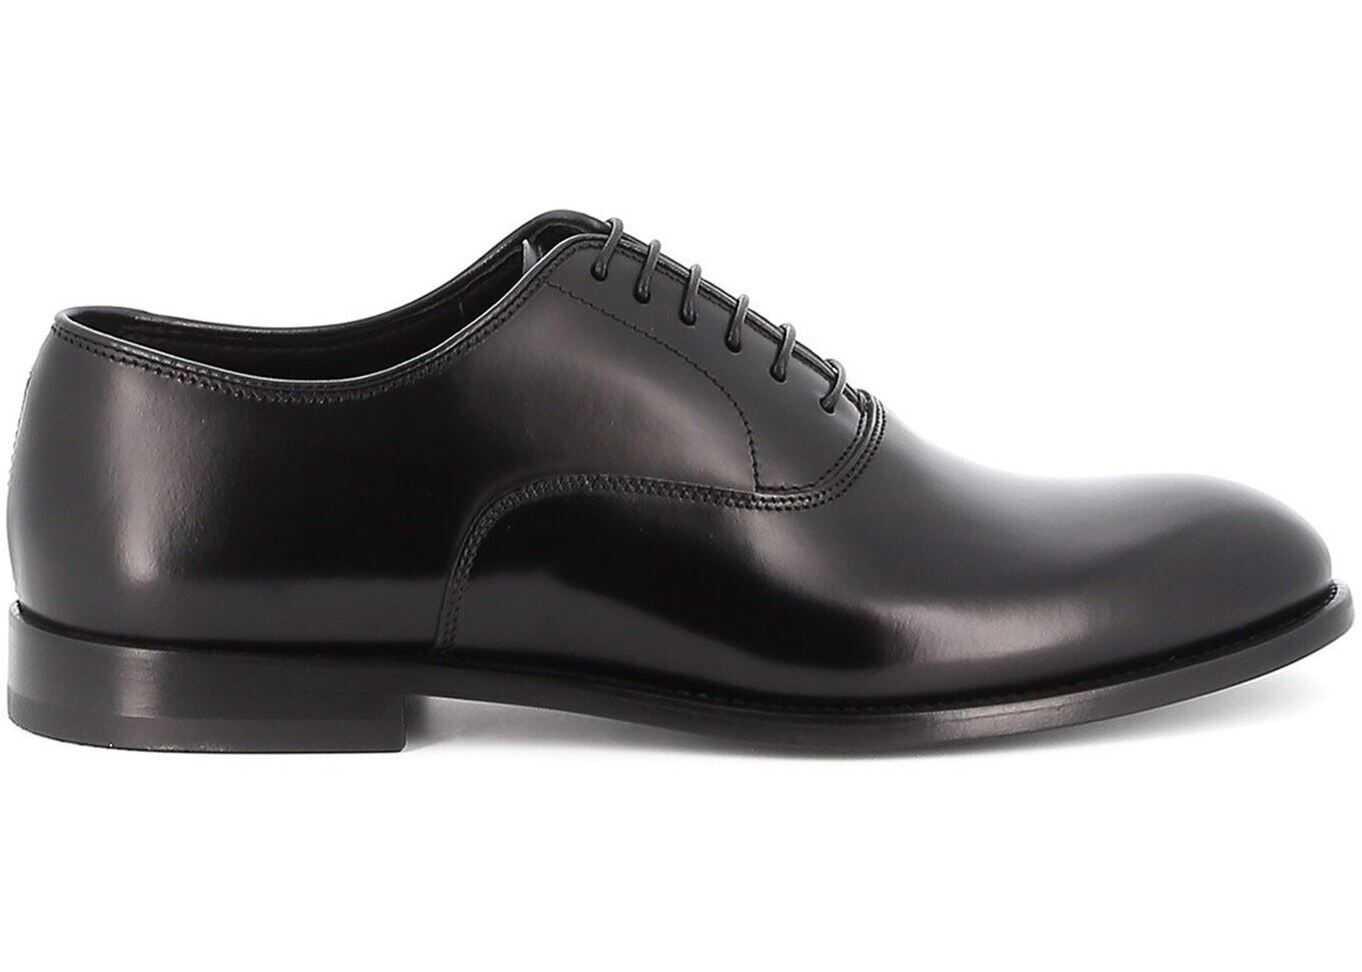 Doucal's Brushed Leather Black Oxford Shoes DU2630YORKUF028NN00 Black imagine b-mall.ro